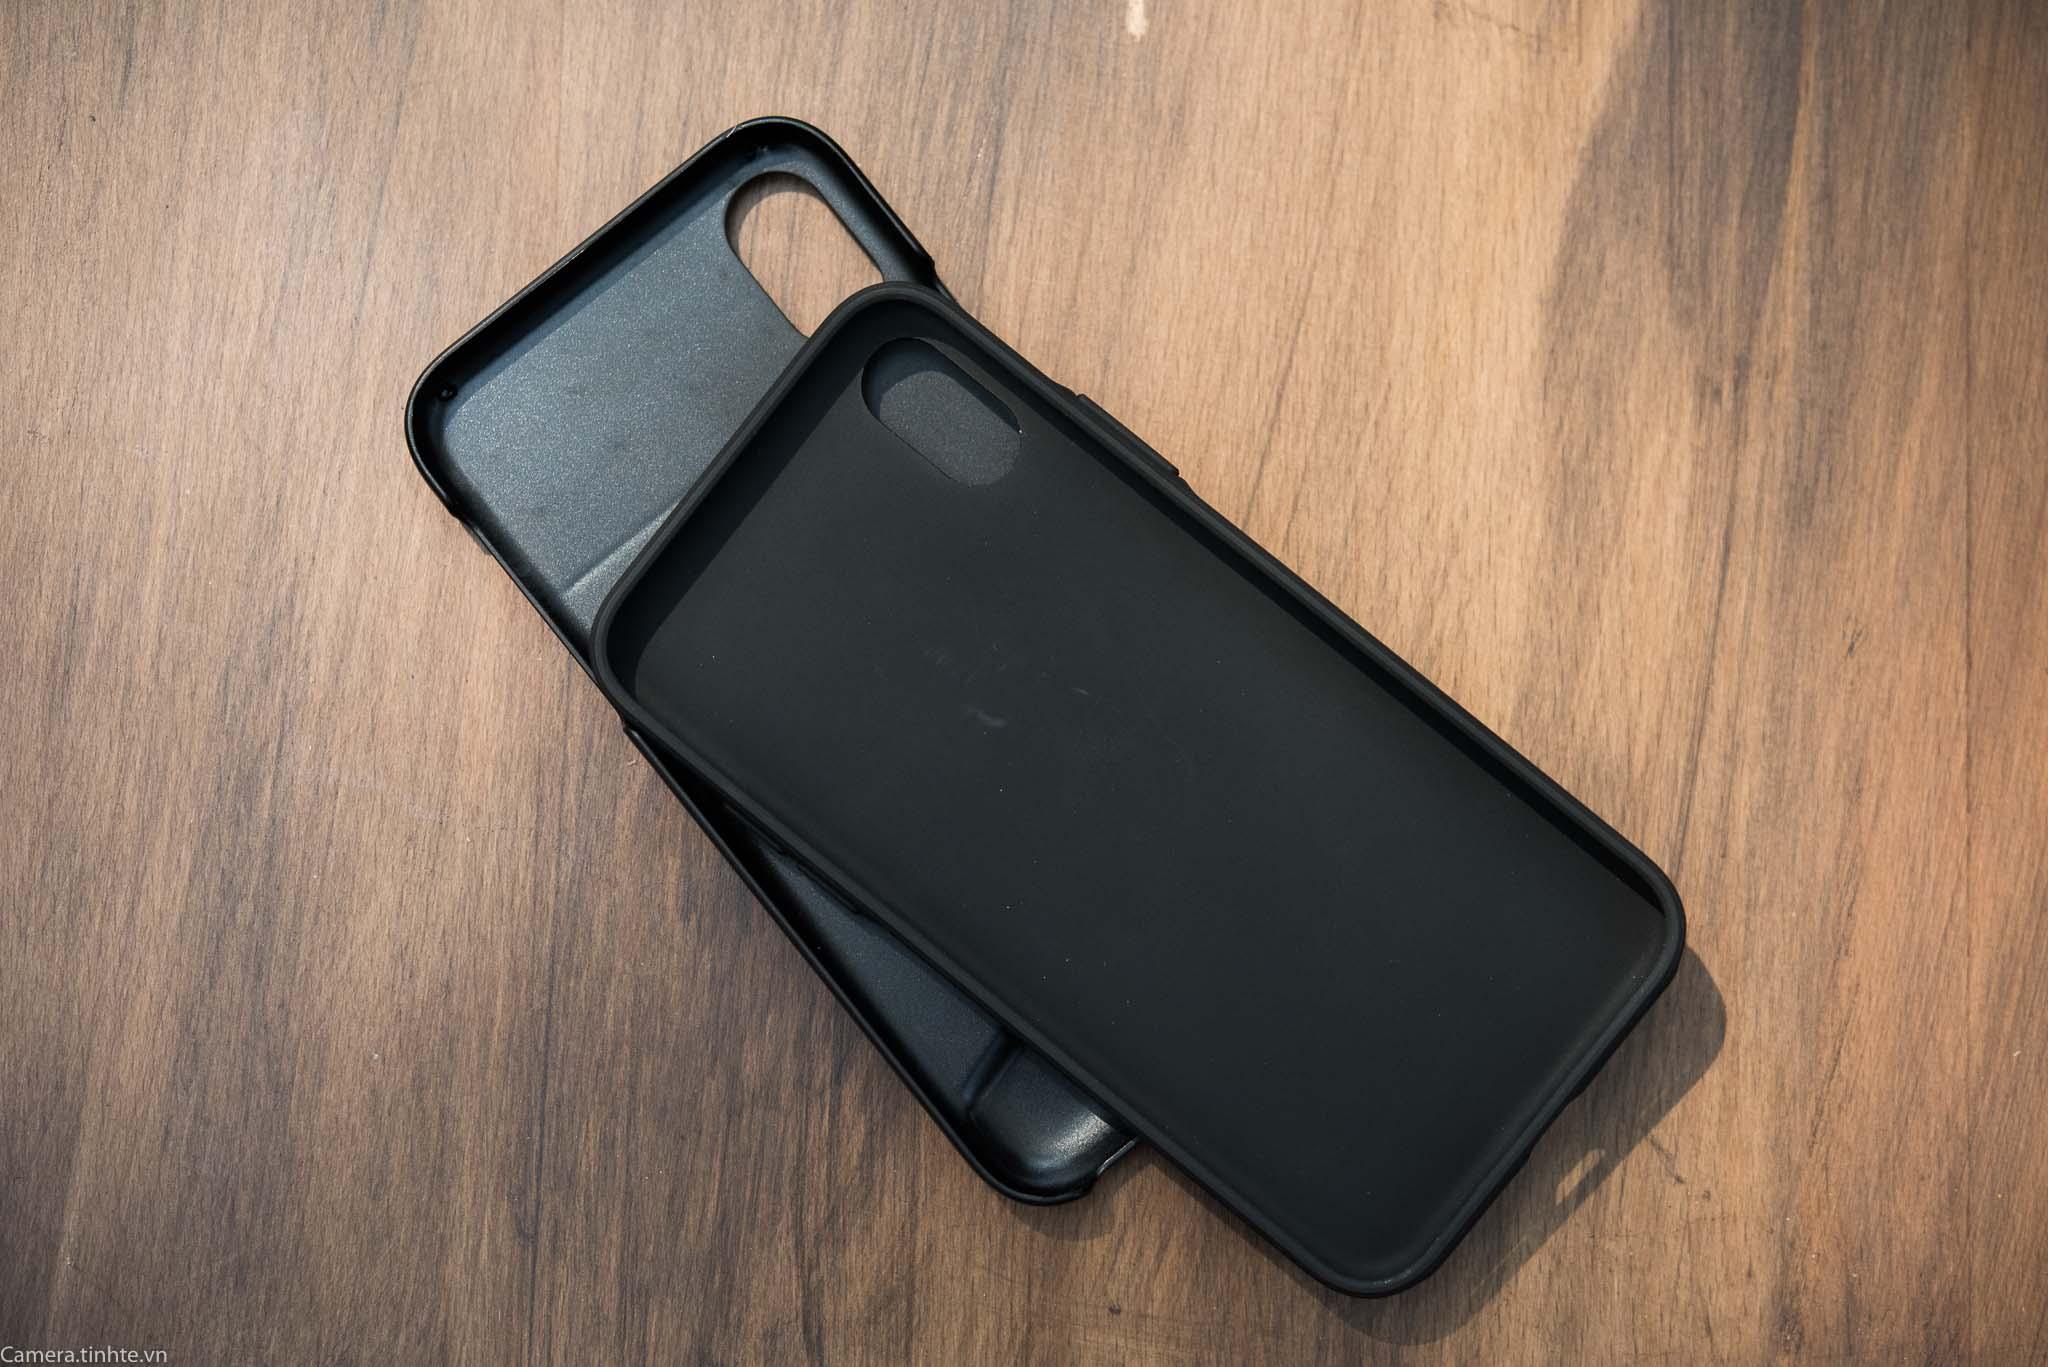 Tren tay ong kinh P-Hole lens iPhone X - Camera.tinhte.vn-1.jpg